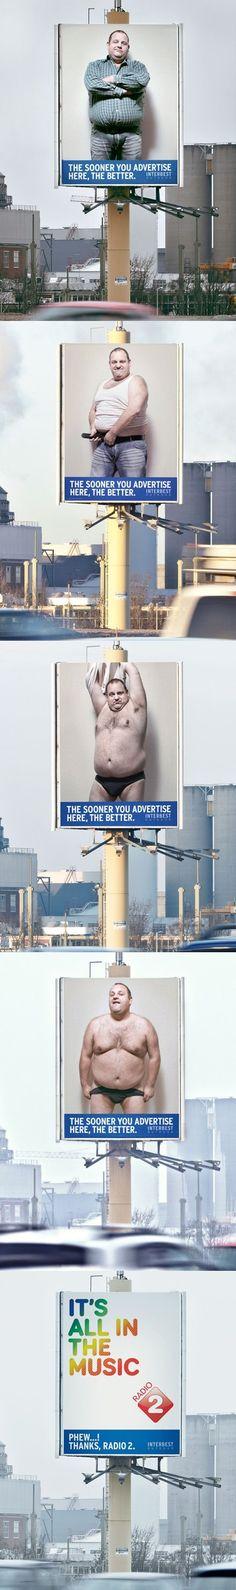 Humorous advertising!